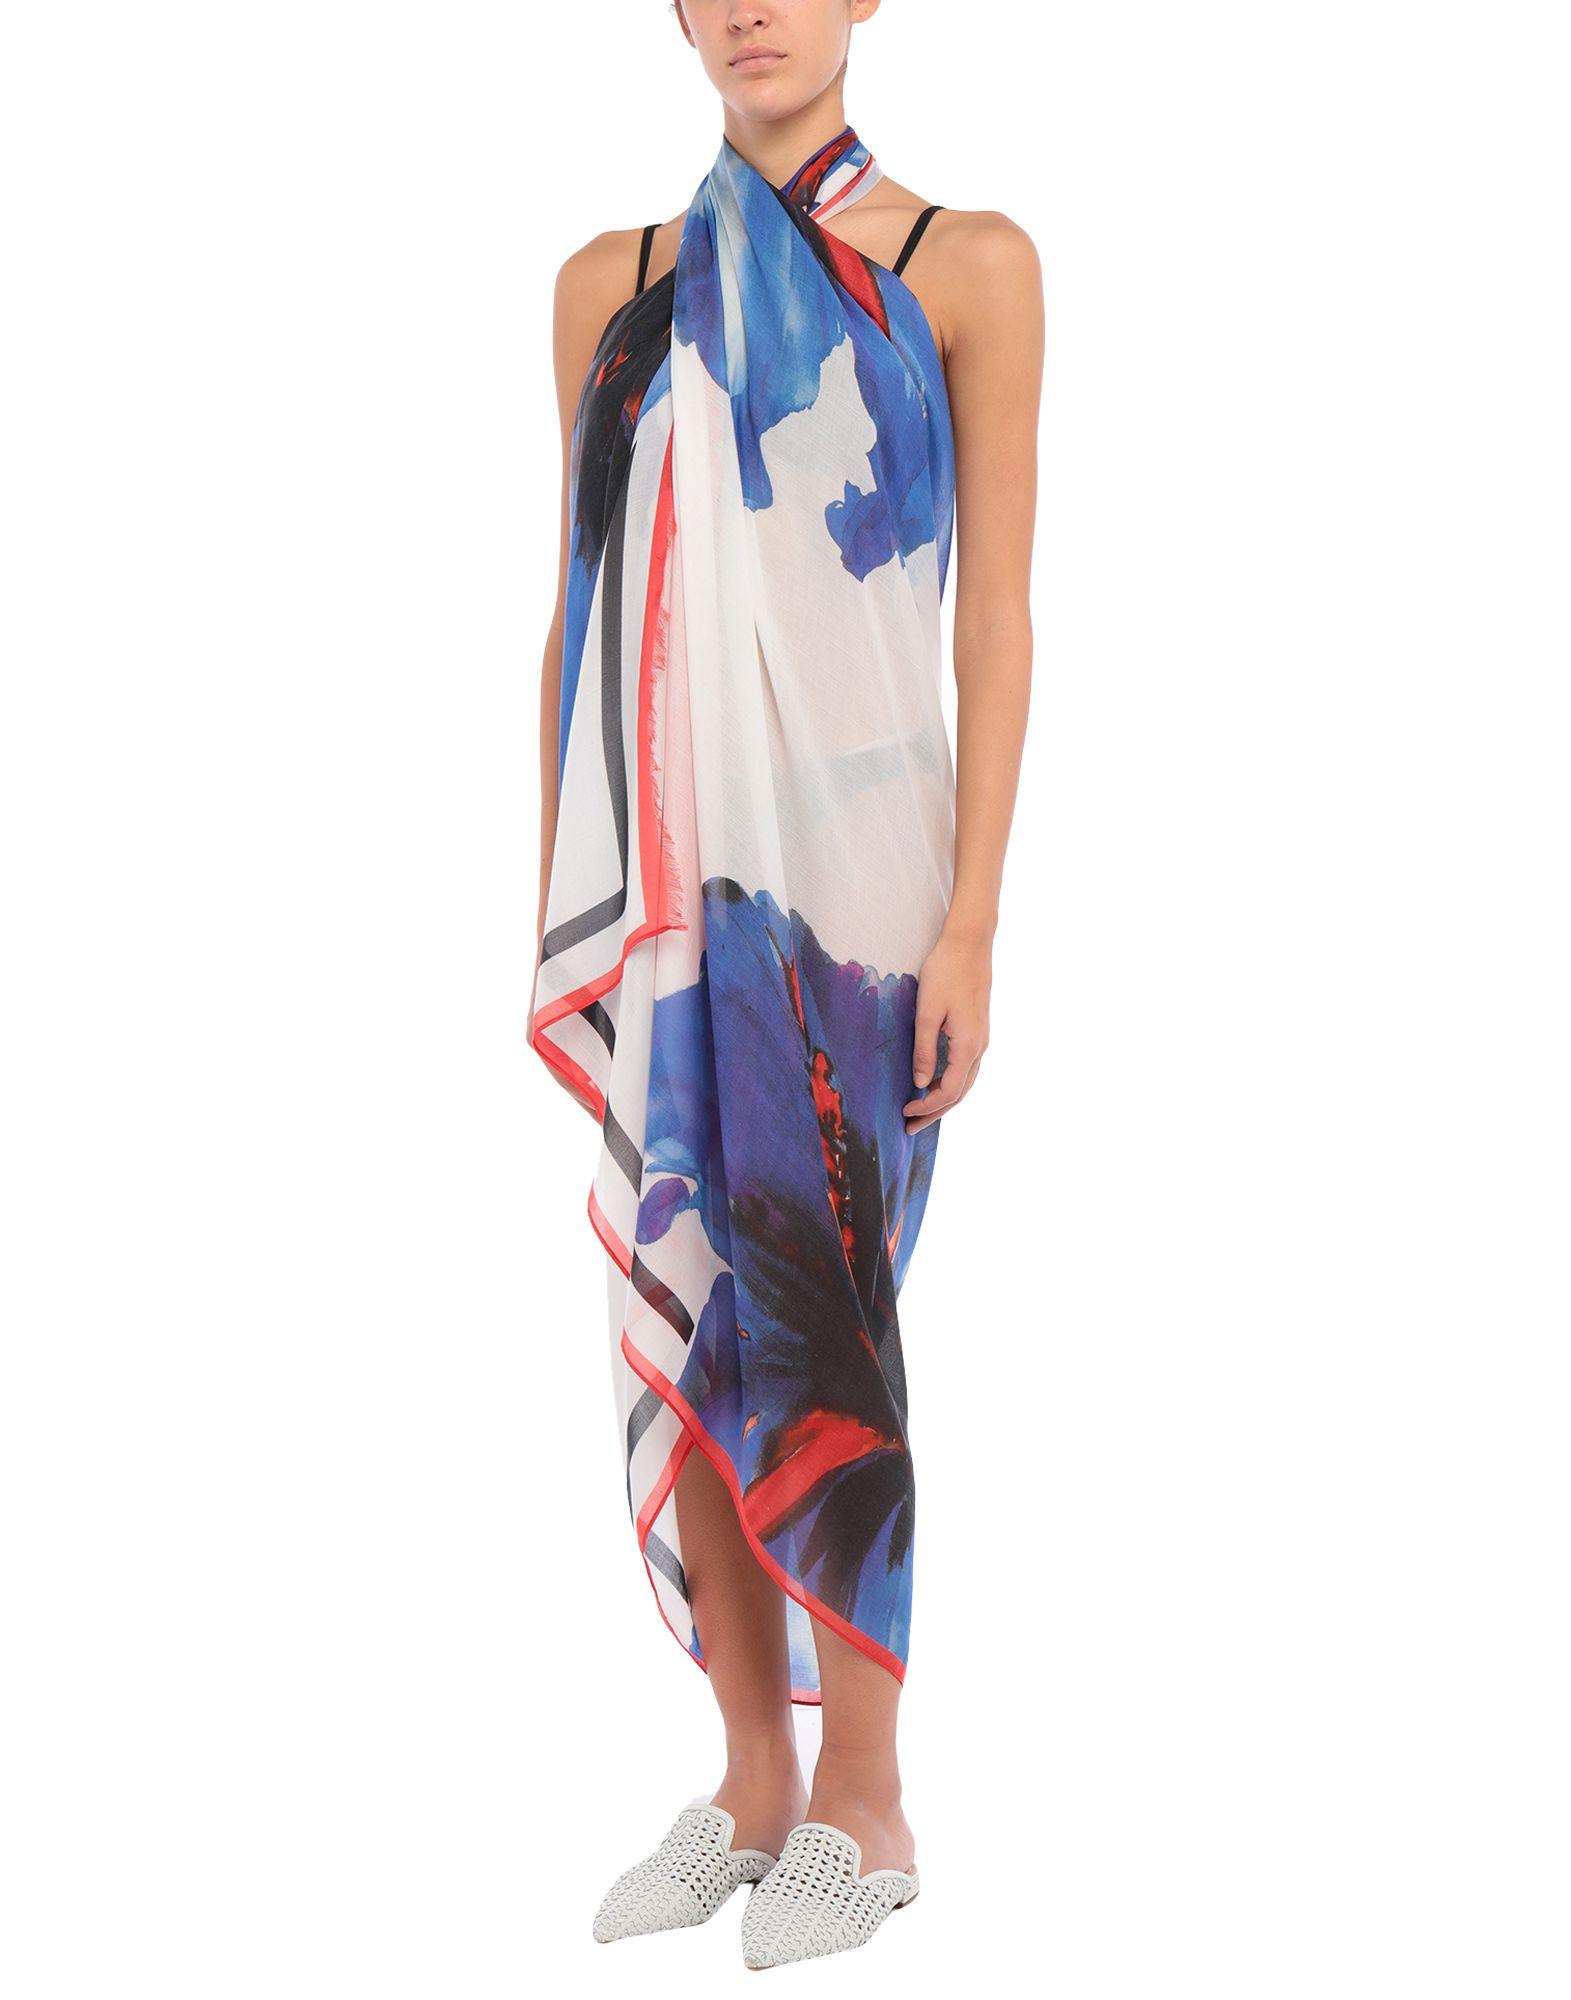 DSQUARED2 Sarongs. plain weave, fringe, multicolor pattern. 85% Modal, 15% Silk